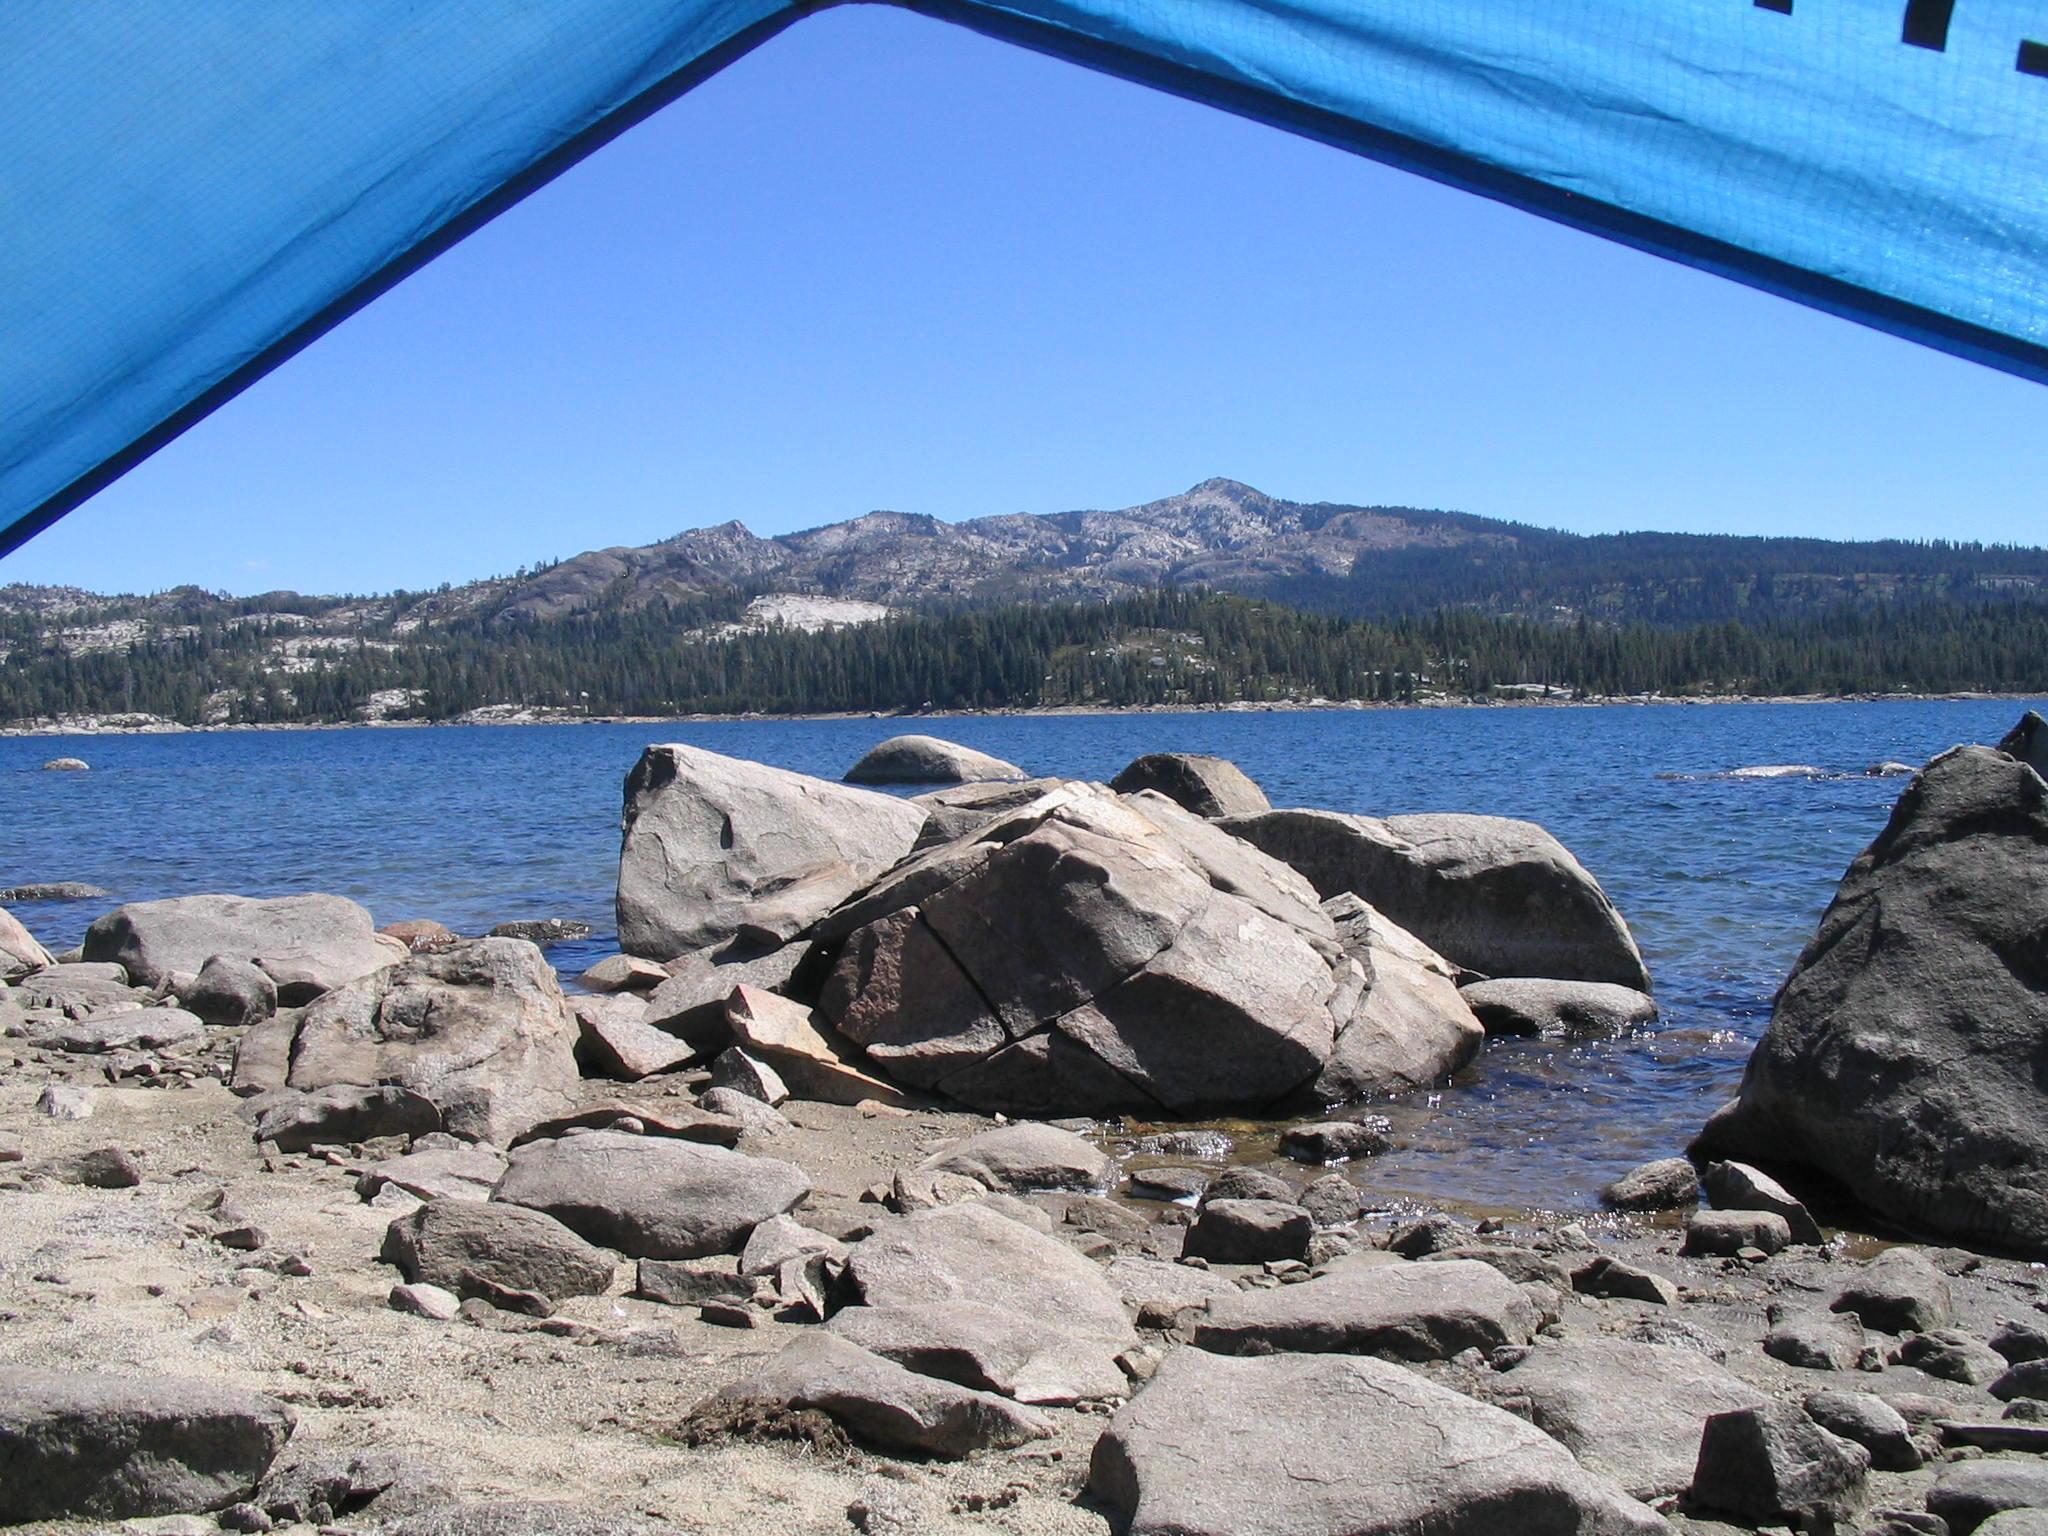 loon-lake-trip-035.JPG